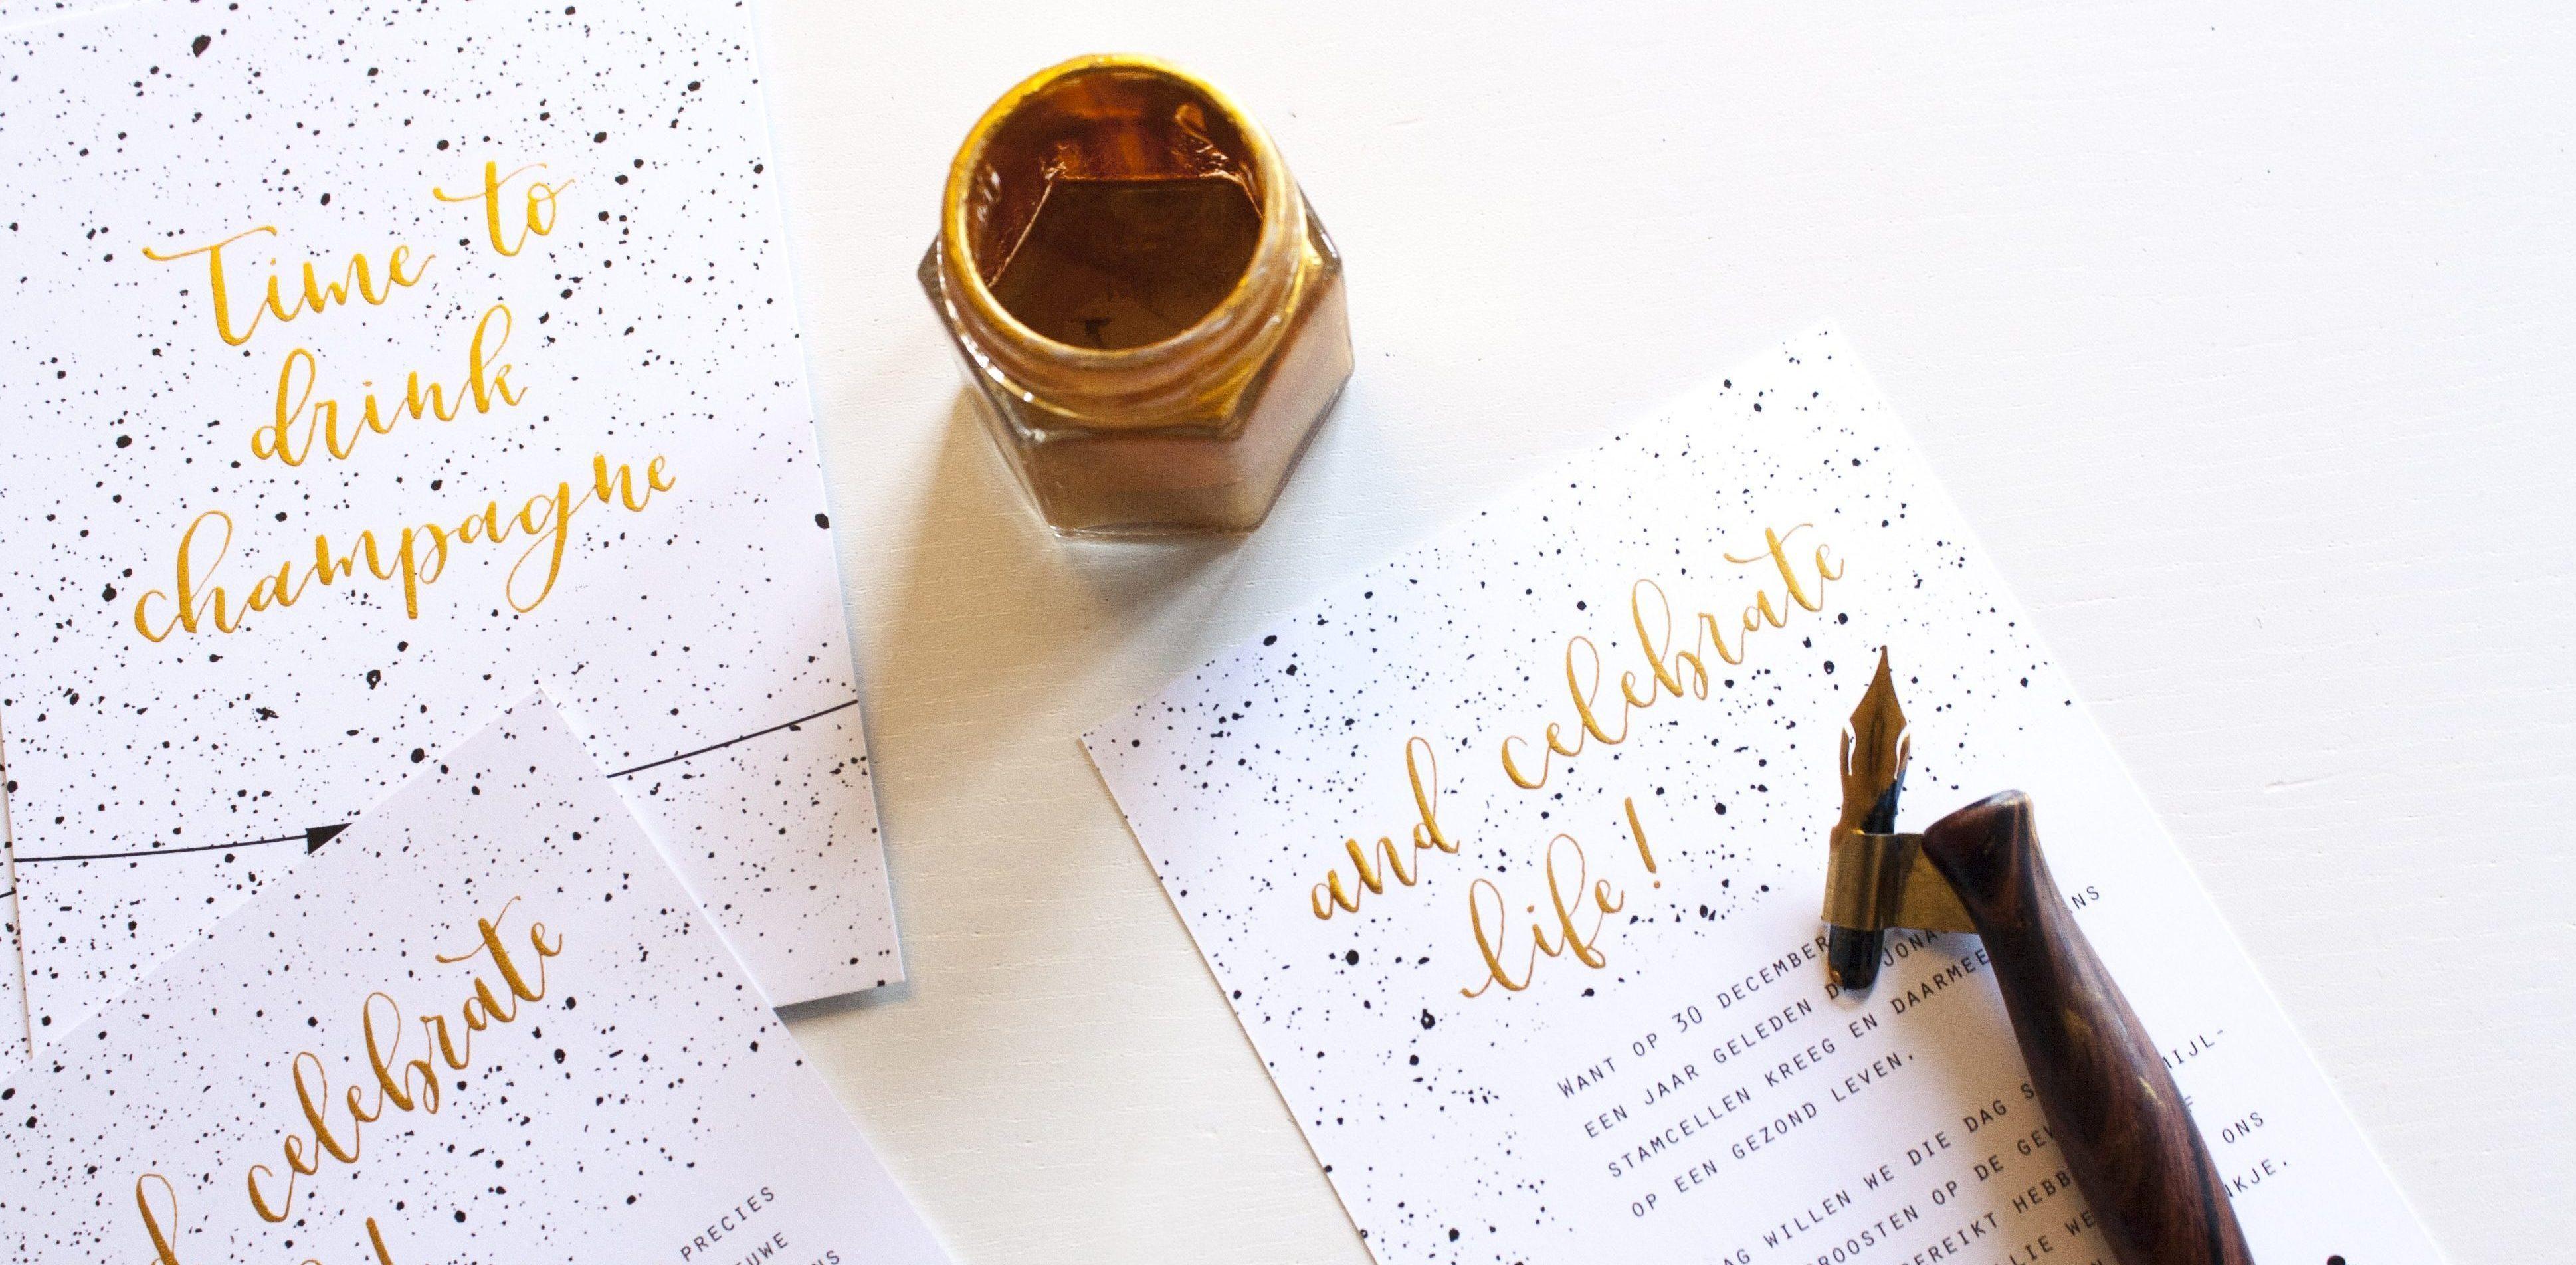 Uitnodiging kalligrafie goud